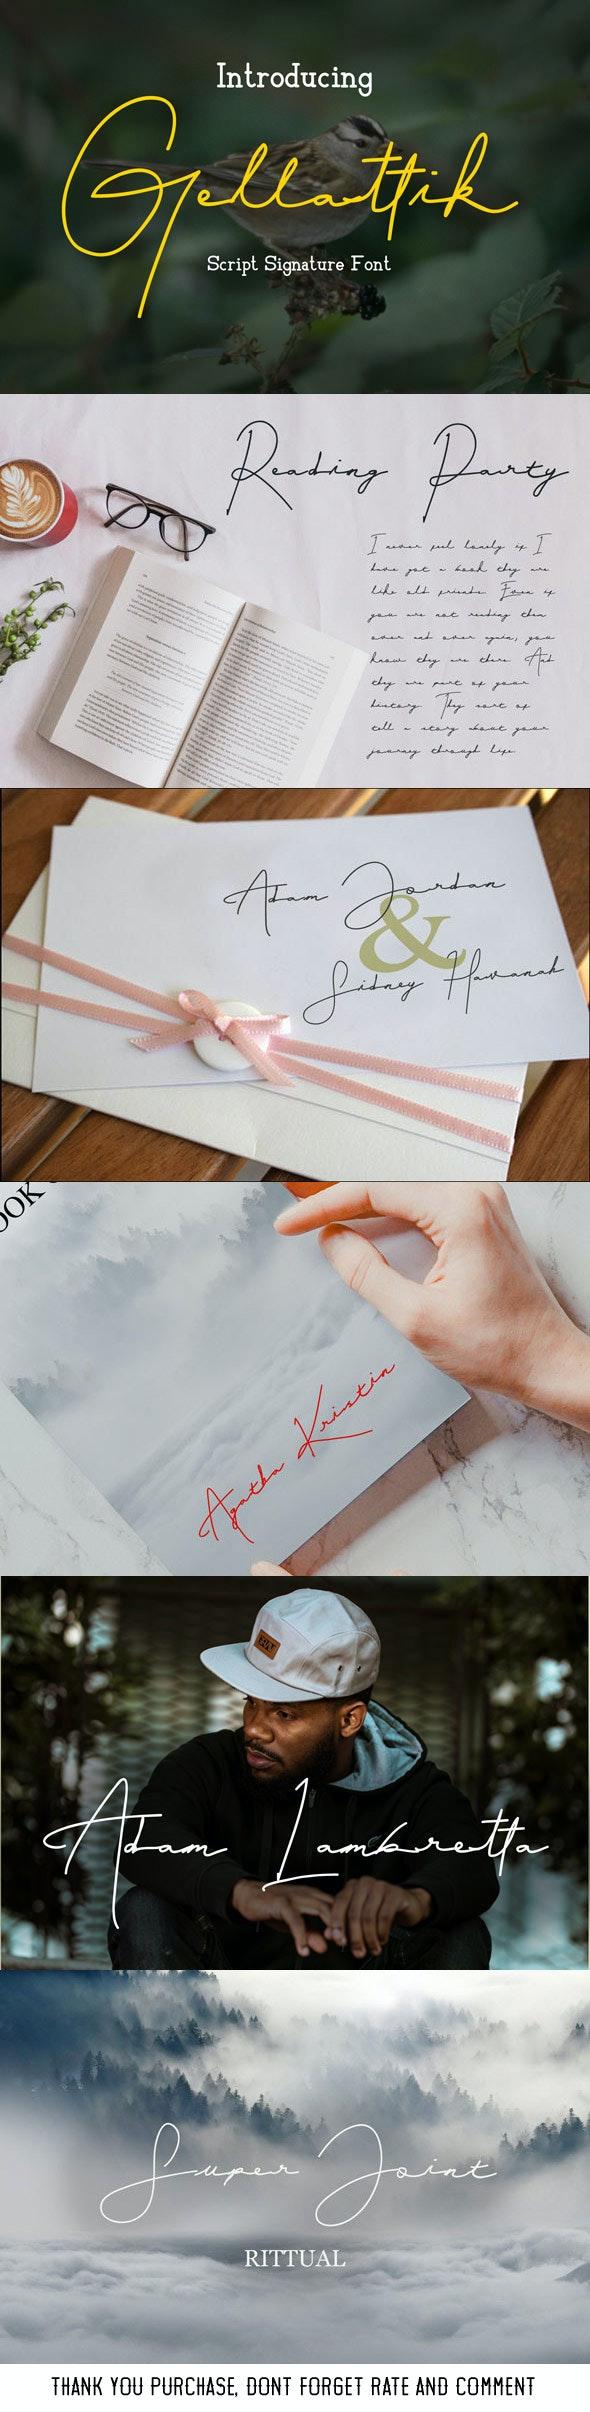 Gellattik - Script Signature Font - Hand-writing Script